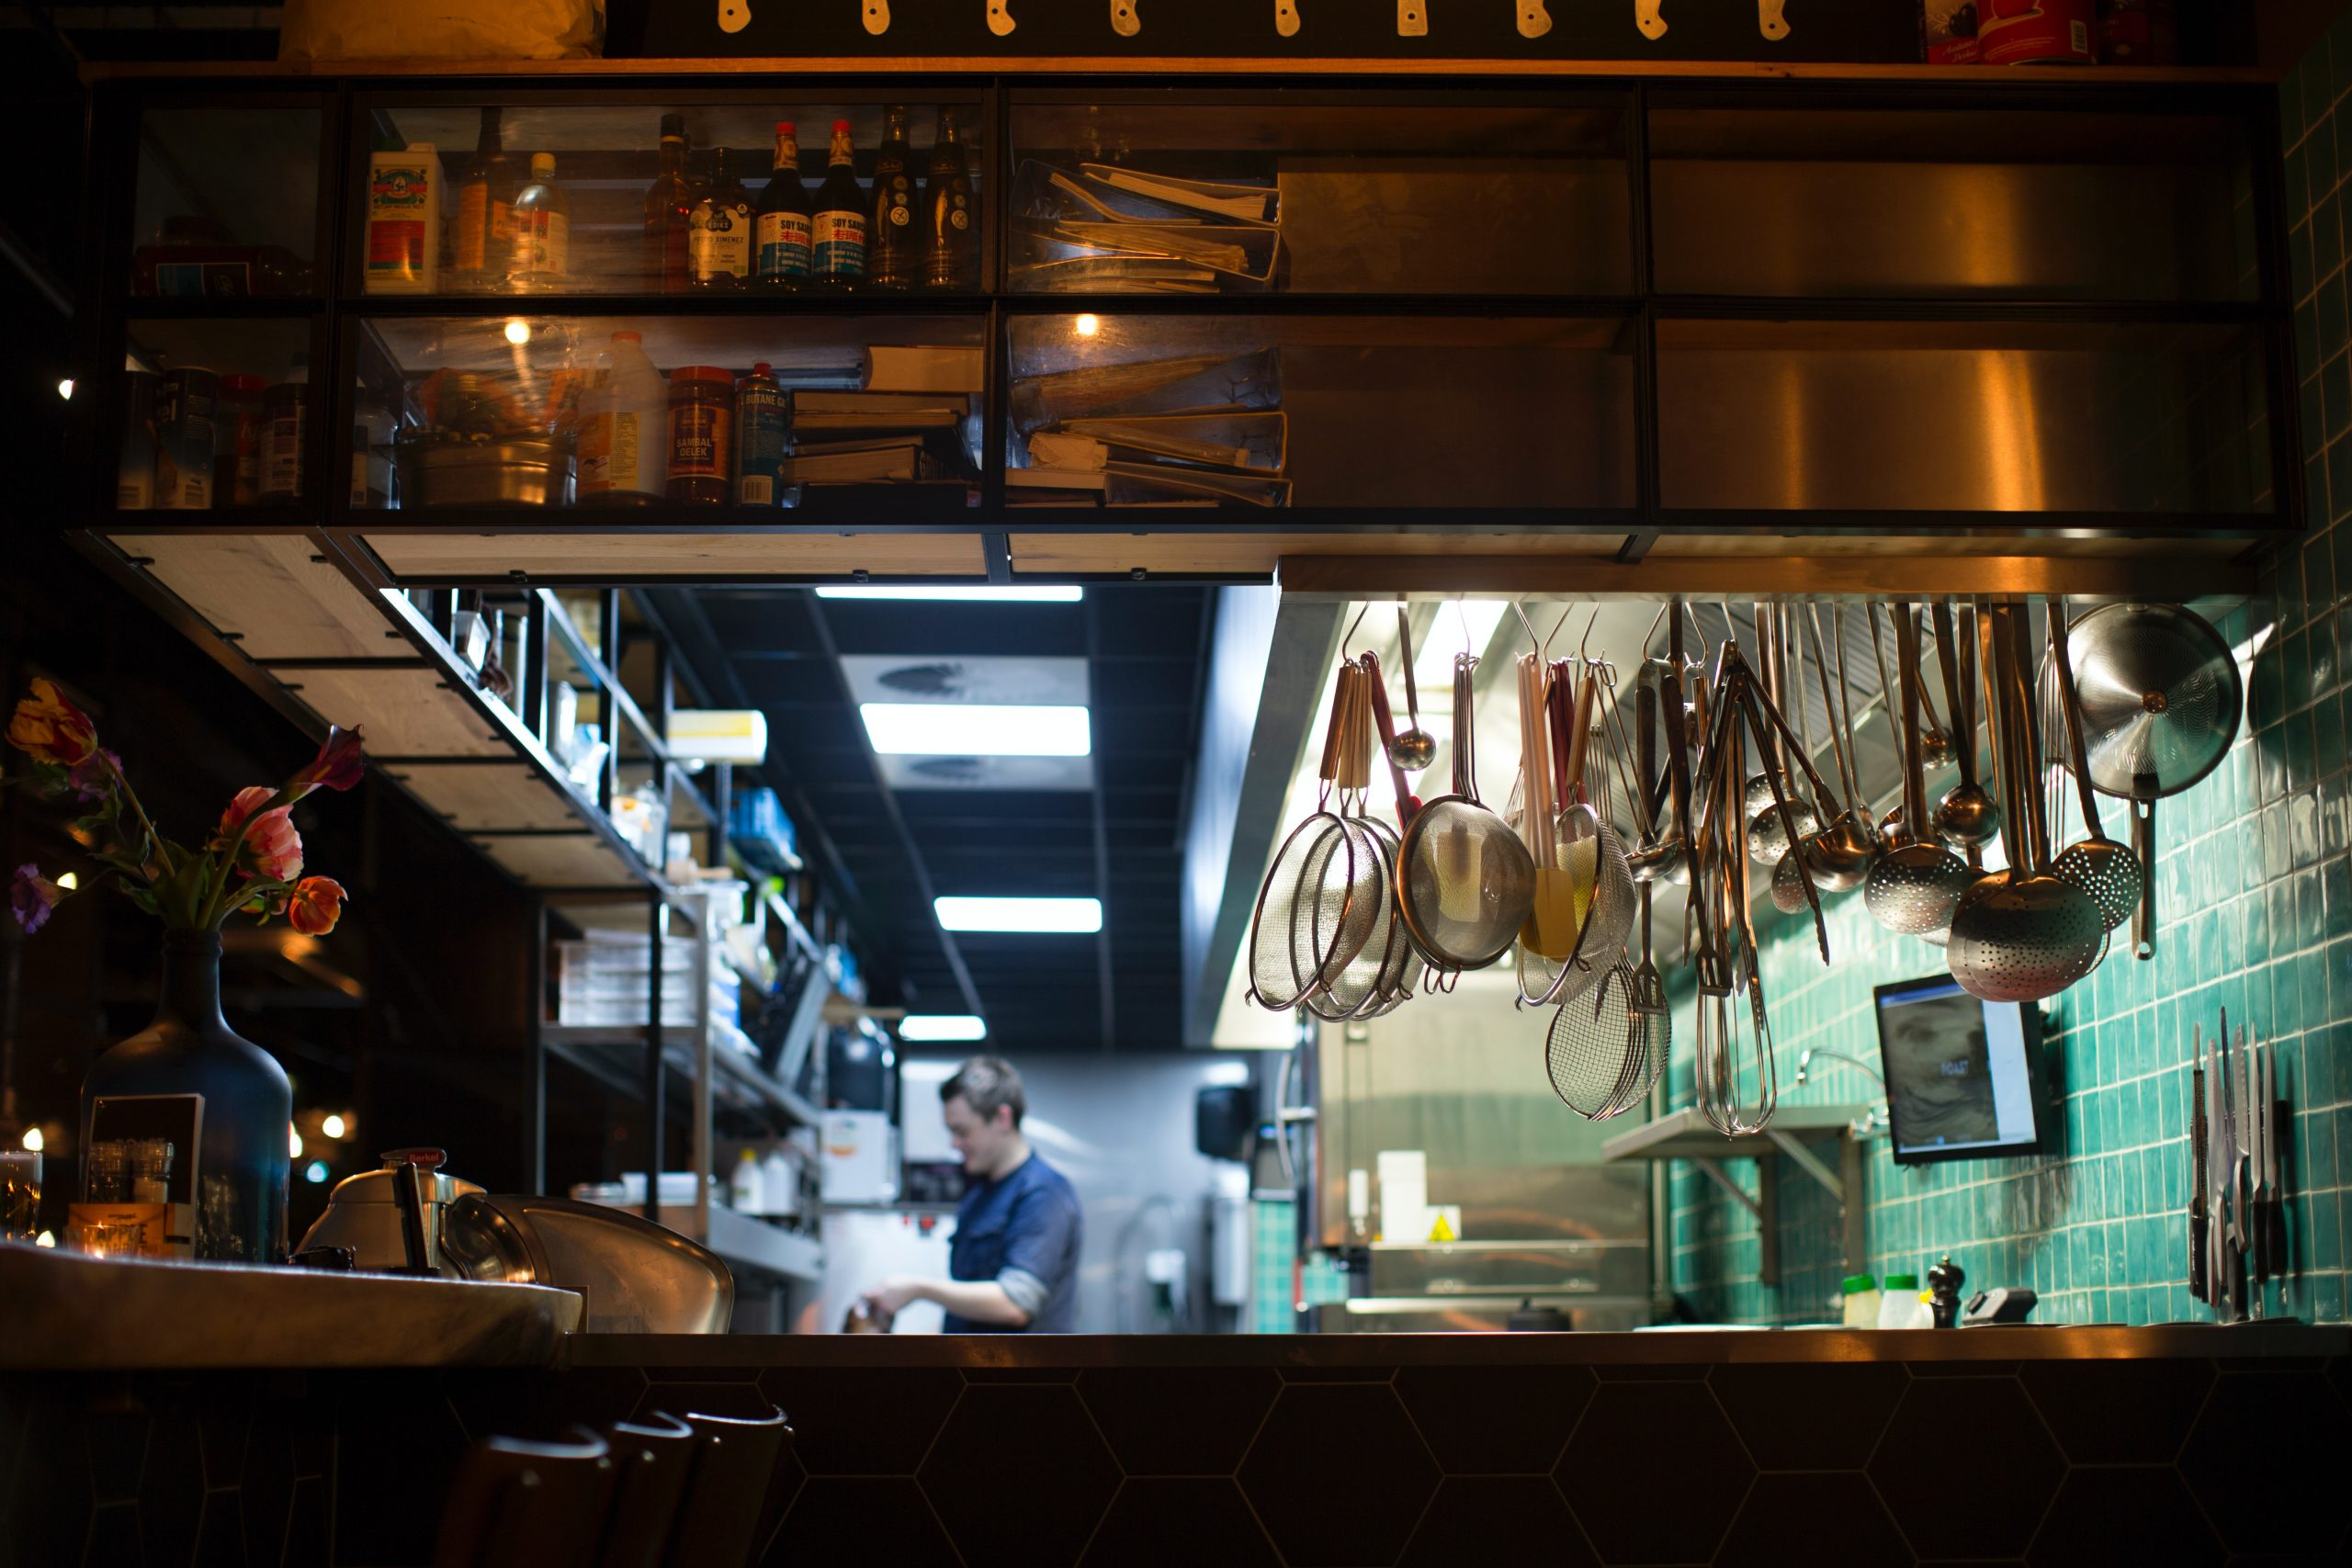 commercial kitchen cleaning | APS-HOODS | Denver | Colorado